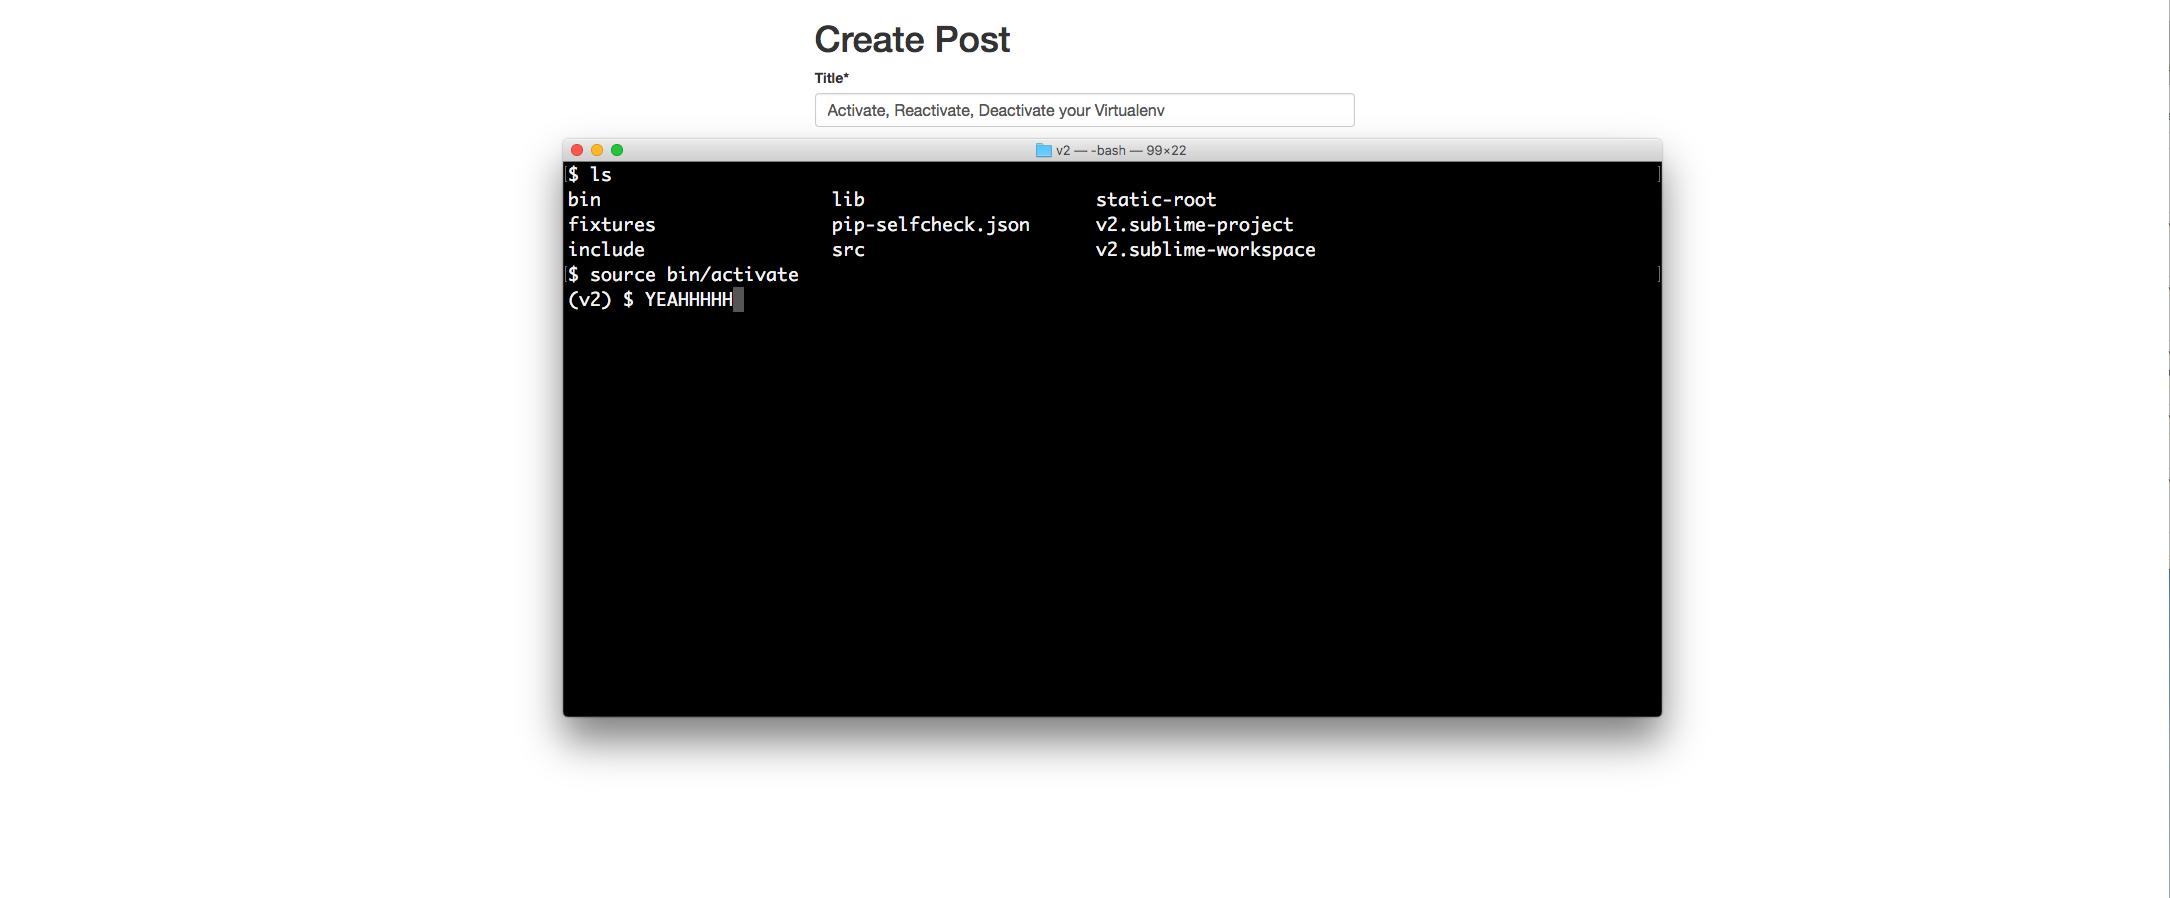 Activate, Reactivate, Deactivate your Virtualenv   Post